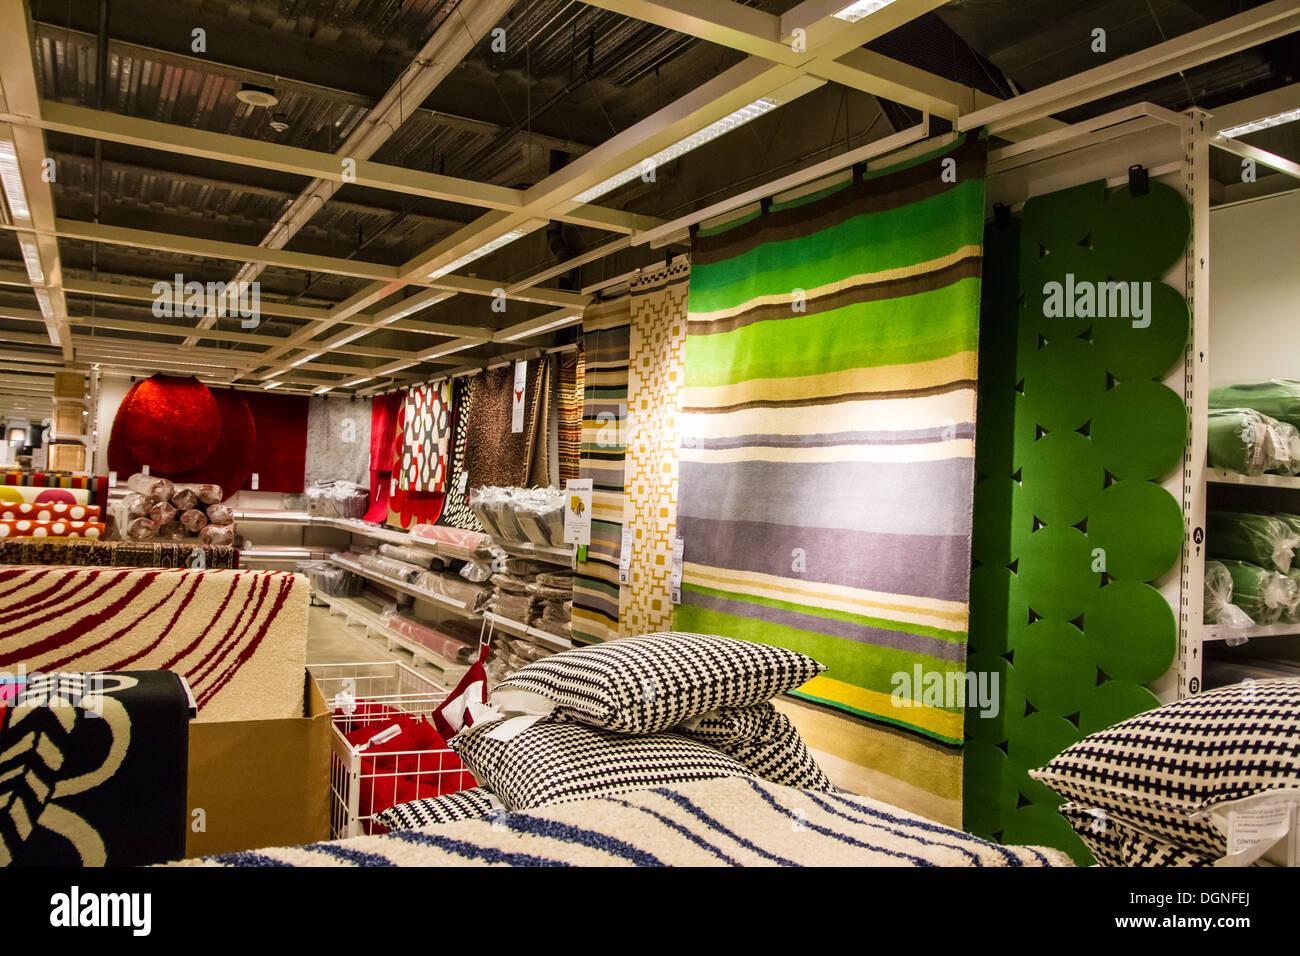 Inside The Ikea Store In Burbank Califorinia   Stock Image